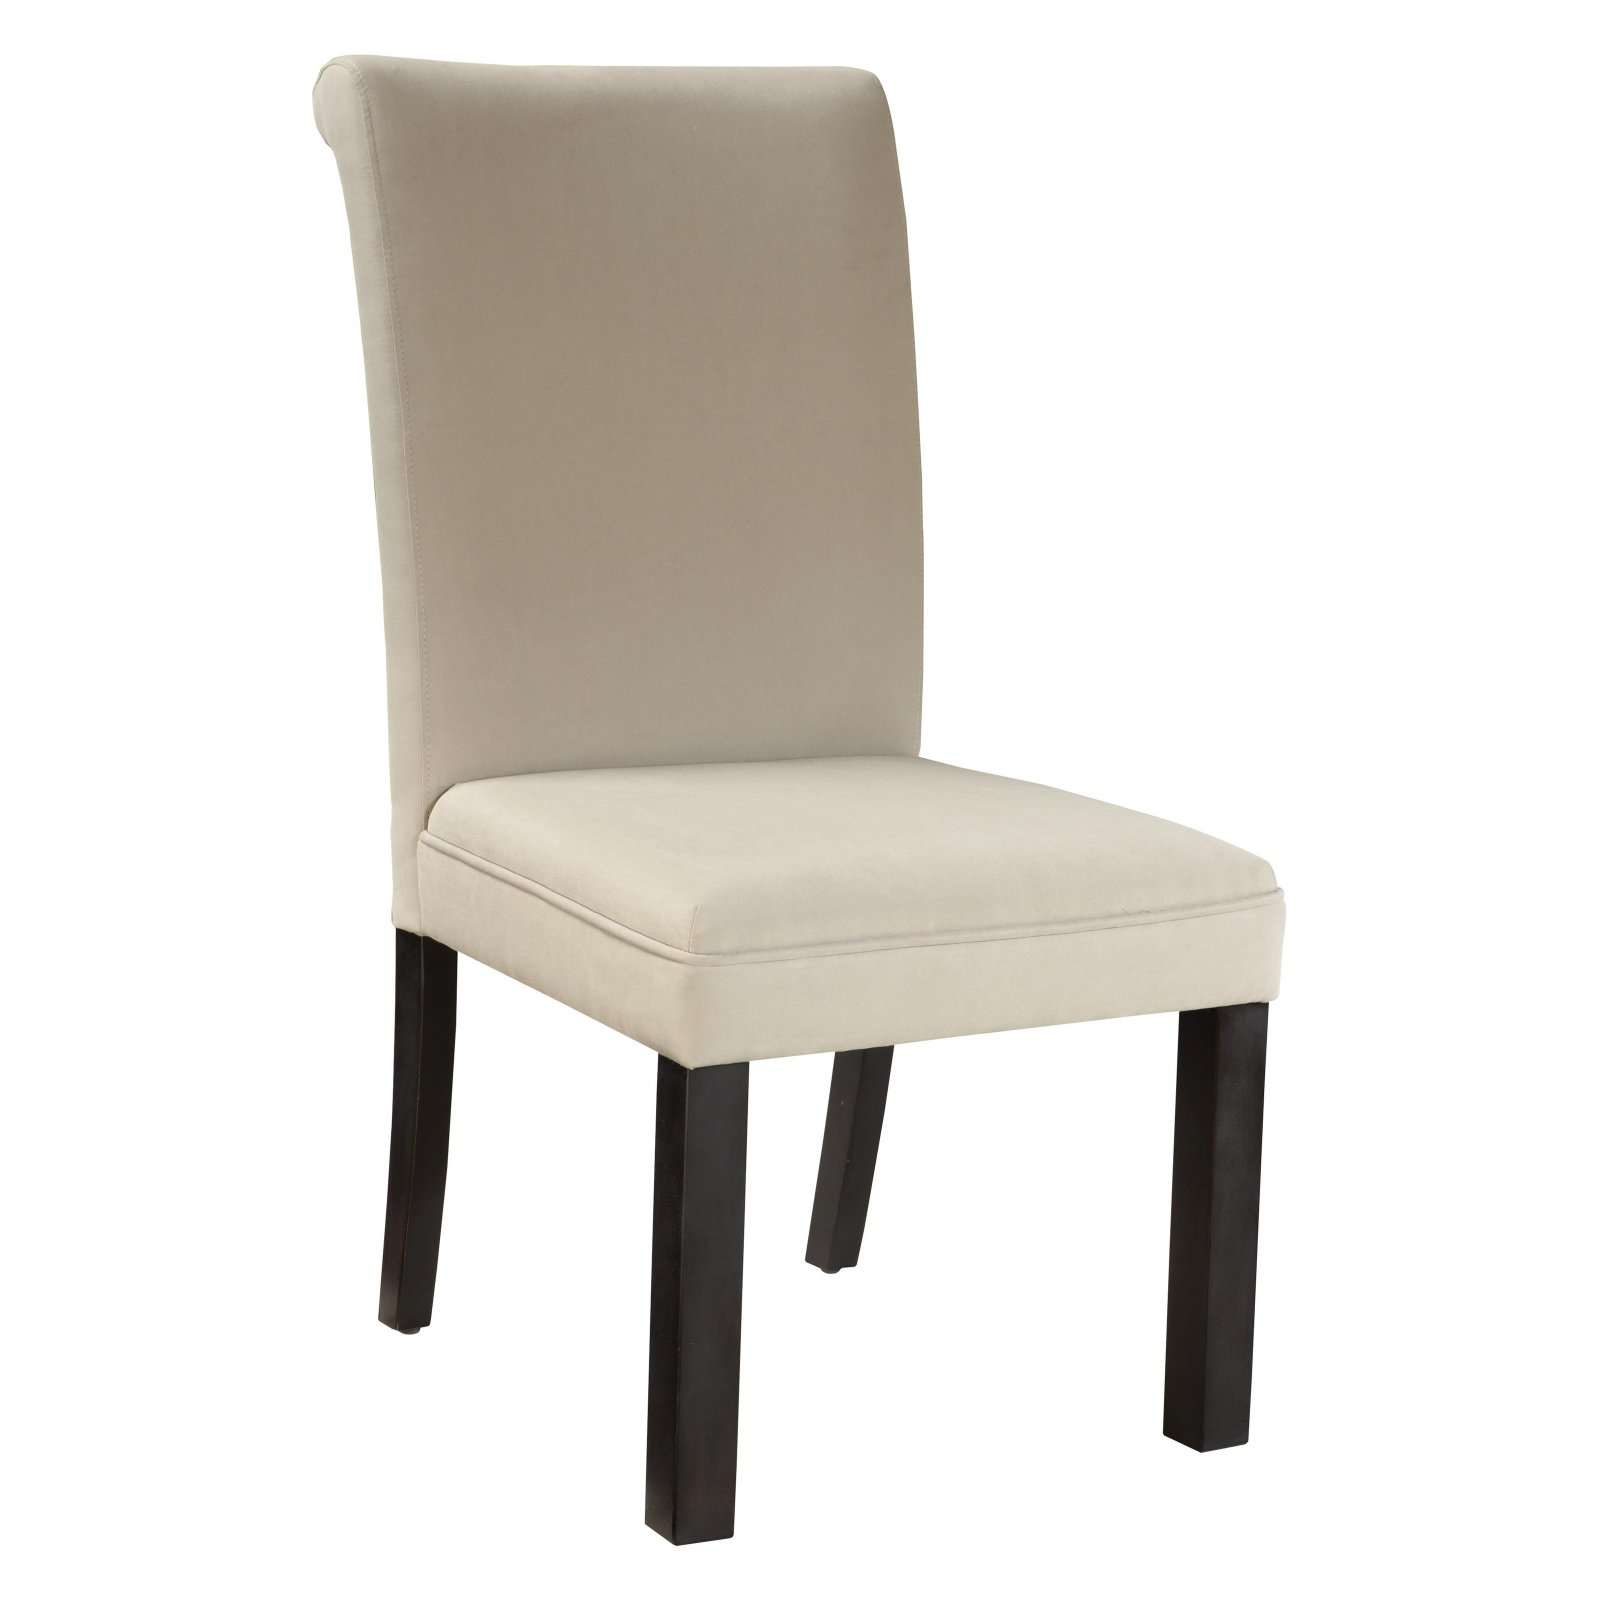 Standard Furniture Gateway Parsons Dining Chair Dark Chicory Brown Set Of 2 White Furniture Parsons Dining Chairs Parsons Chairs